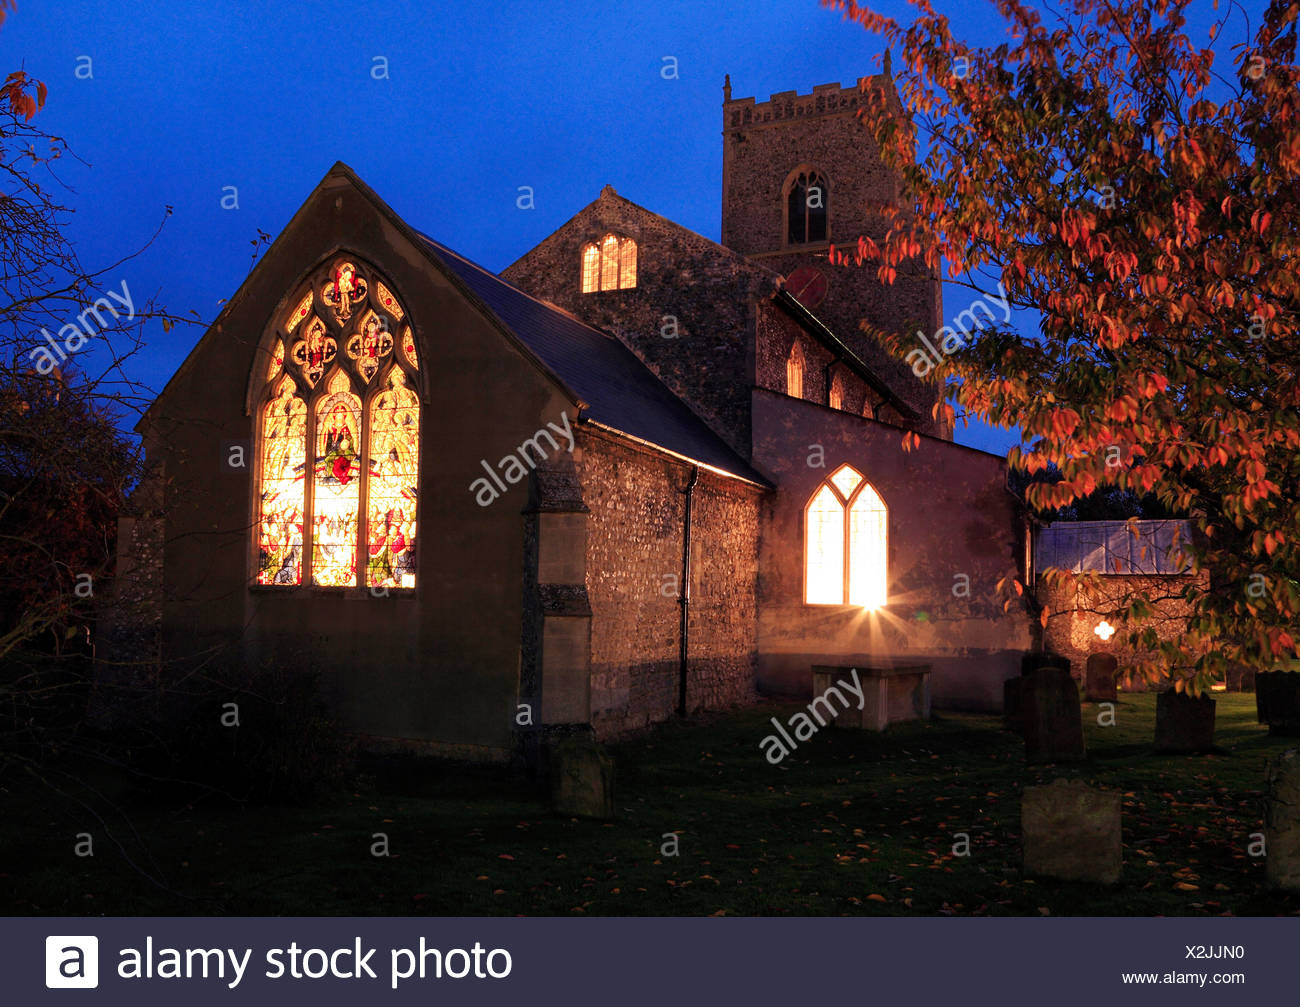 Iglesia Brancaster, este cristal resplandecientes luces a través de la vidriera de noche, Norfolk, Inglaterra Imagen De Stock